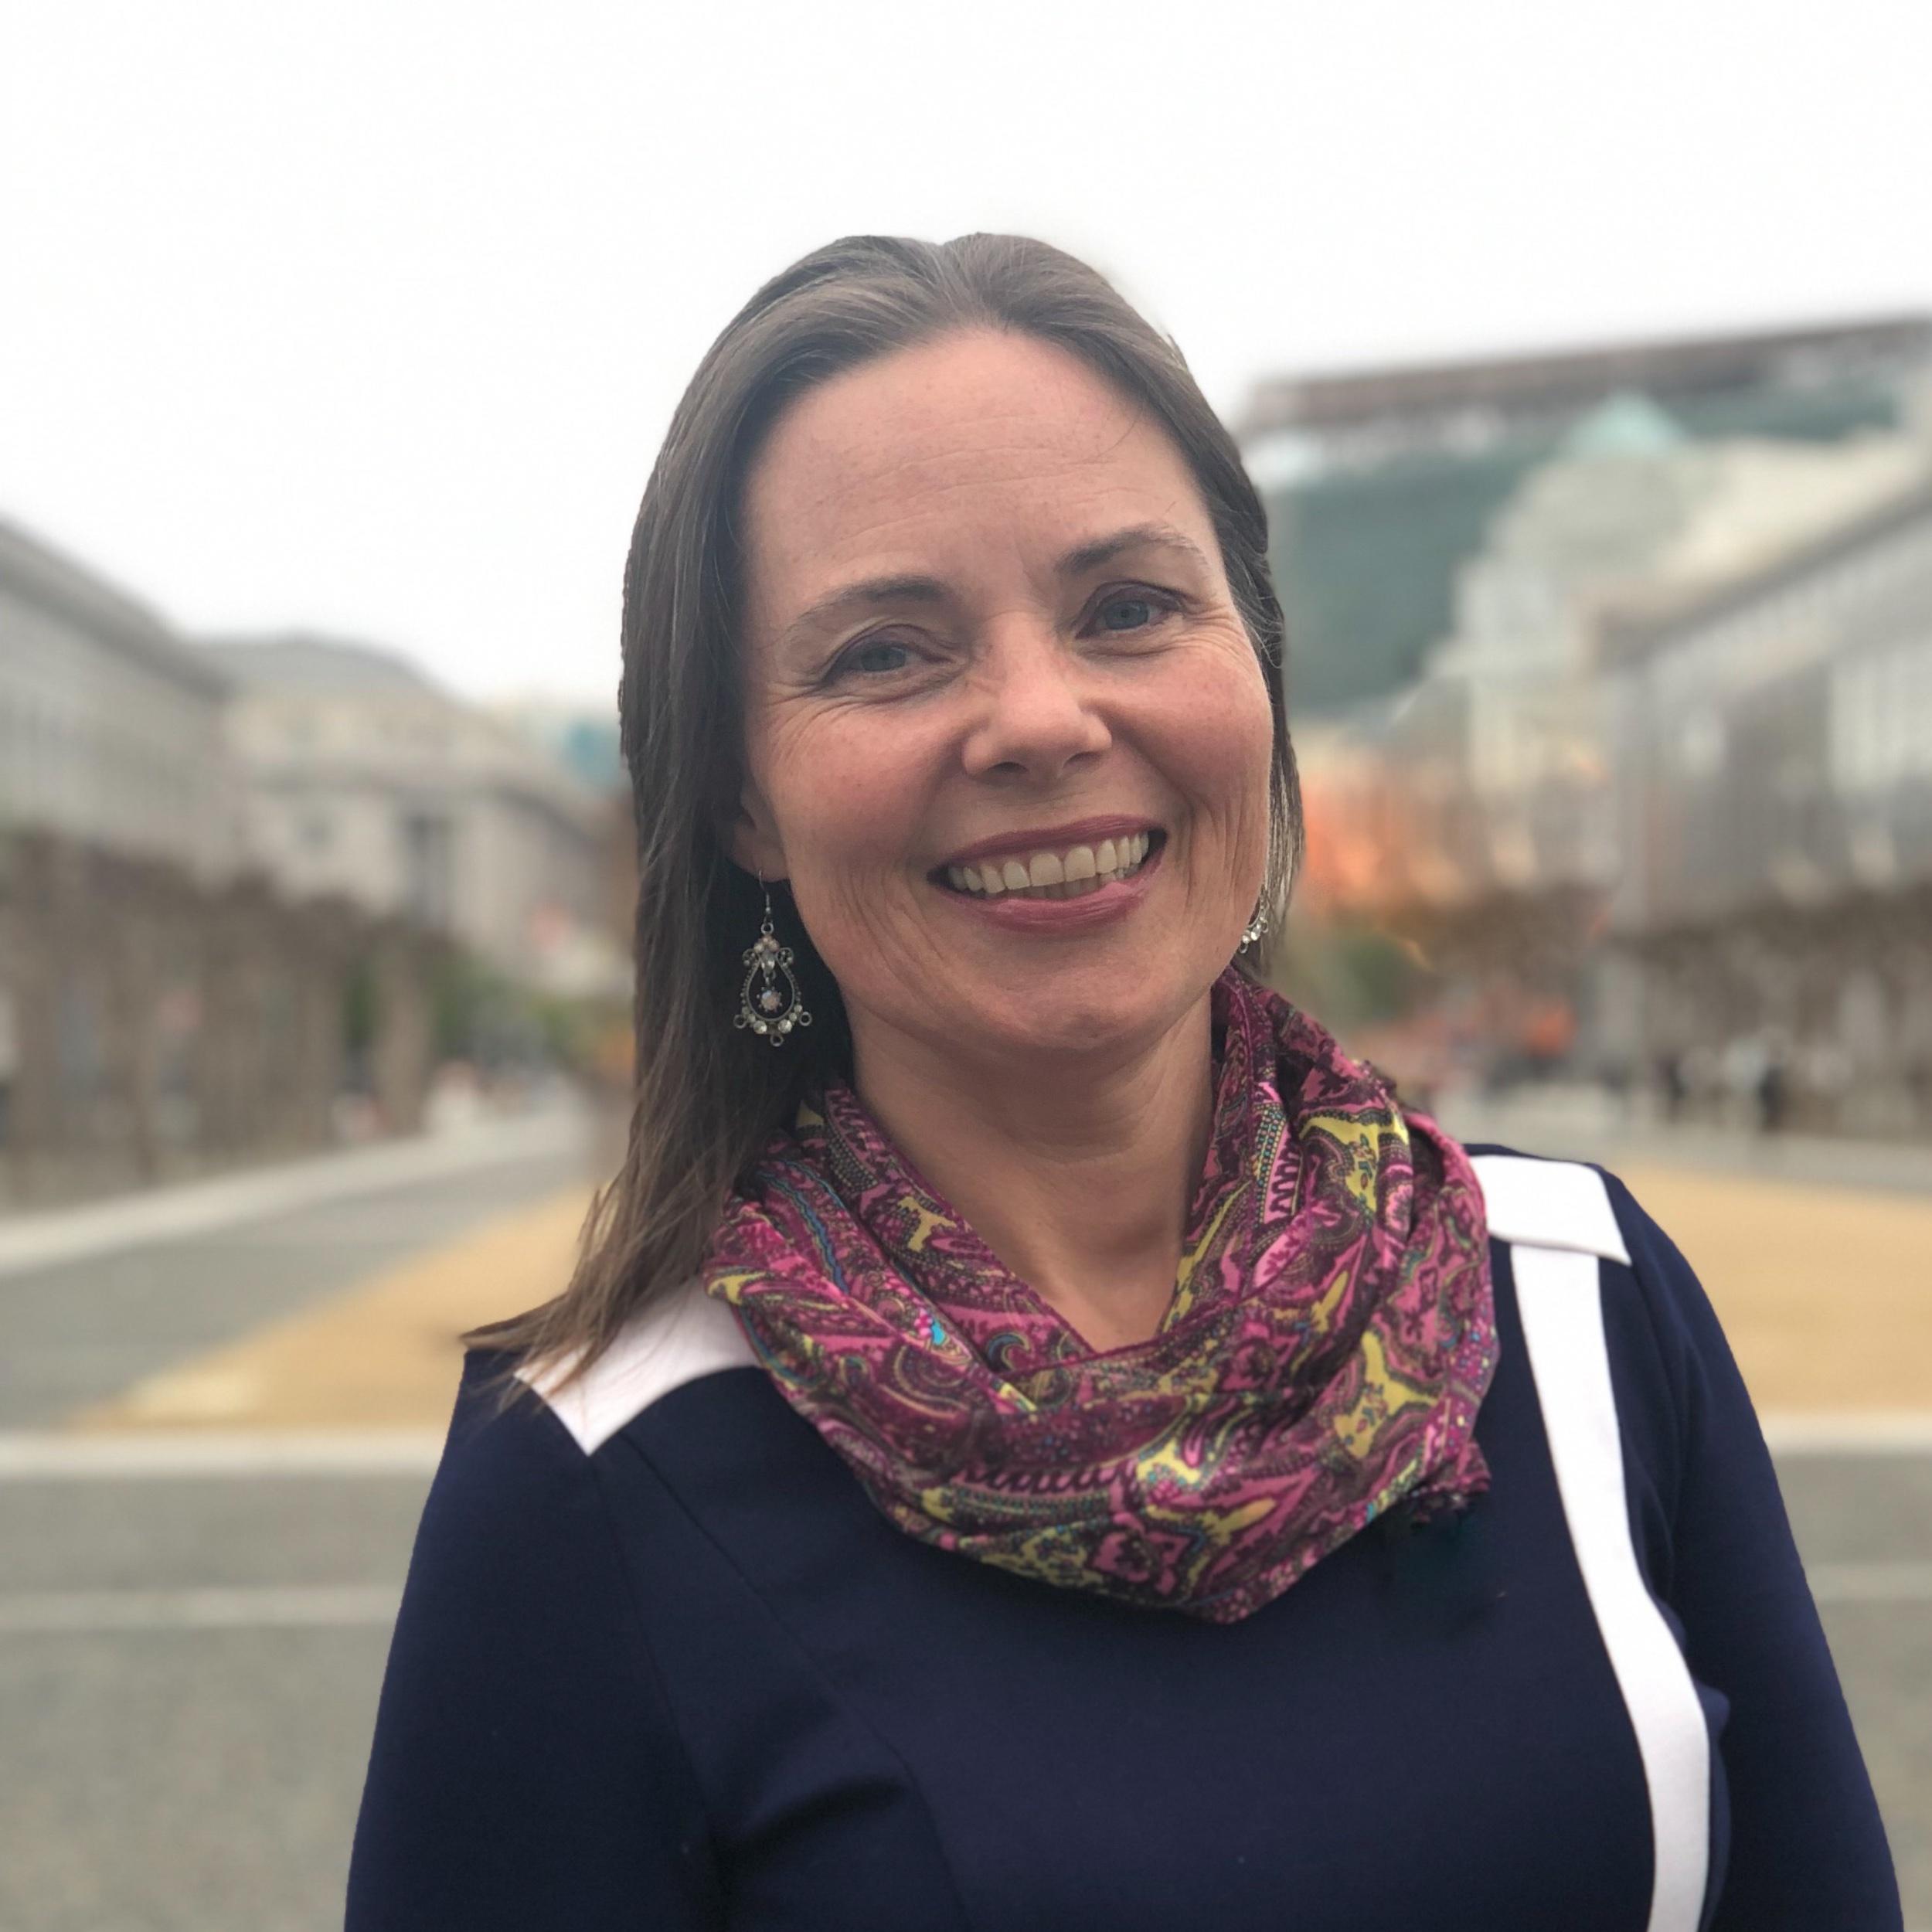 Jacqueline - tech tamer, researcher, strategist,content curator and tipsy copilot.